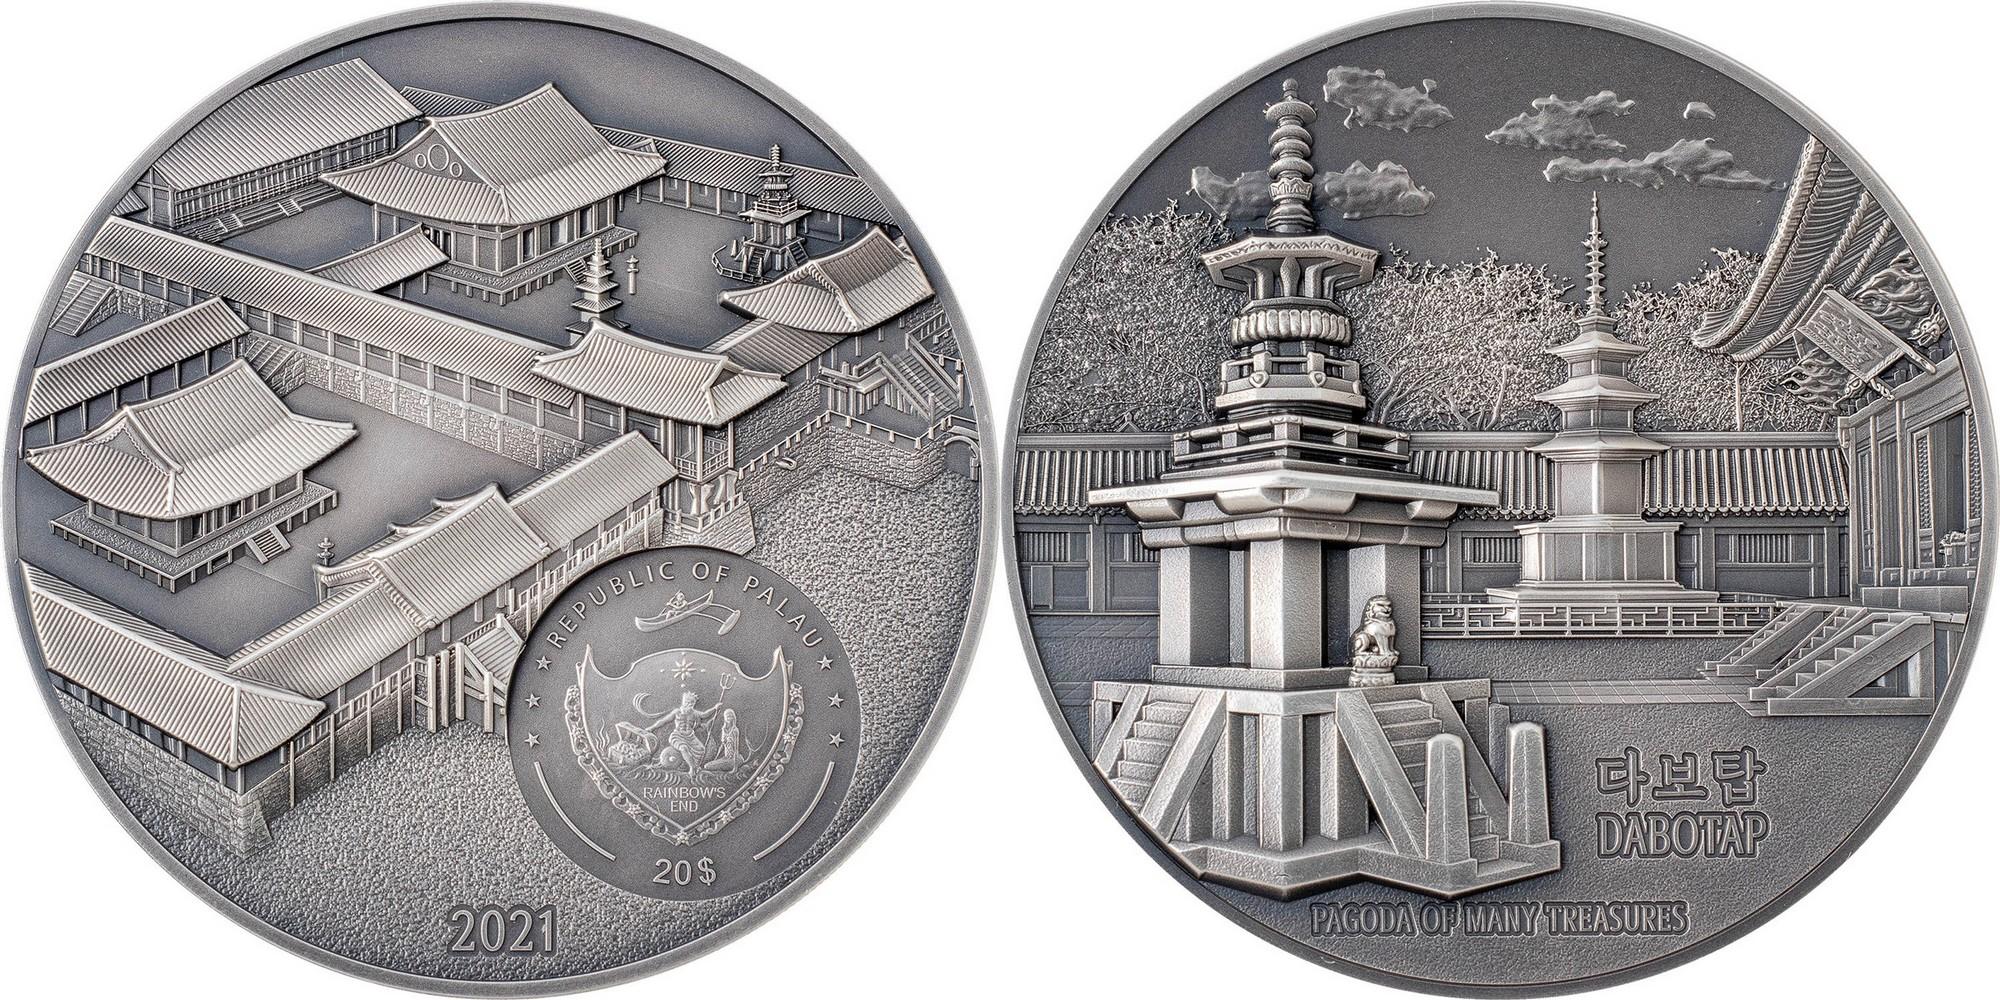 palau-2021-pagode-dabotap